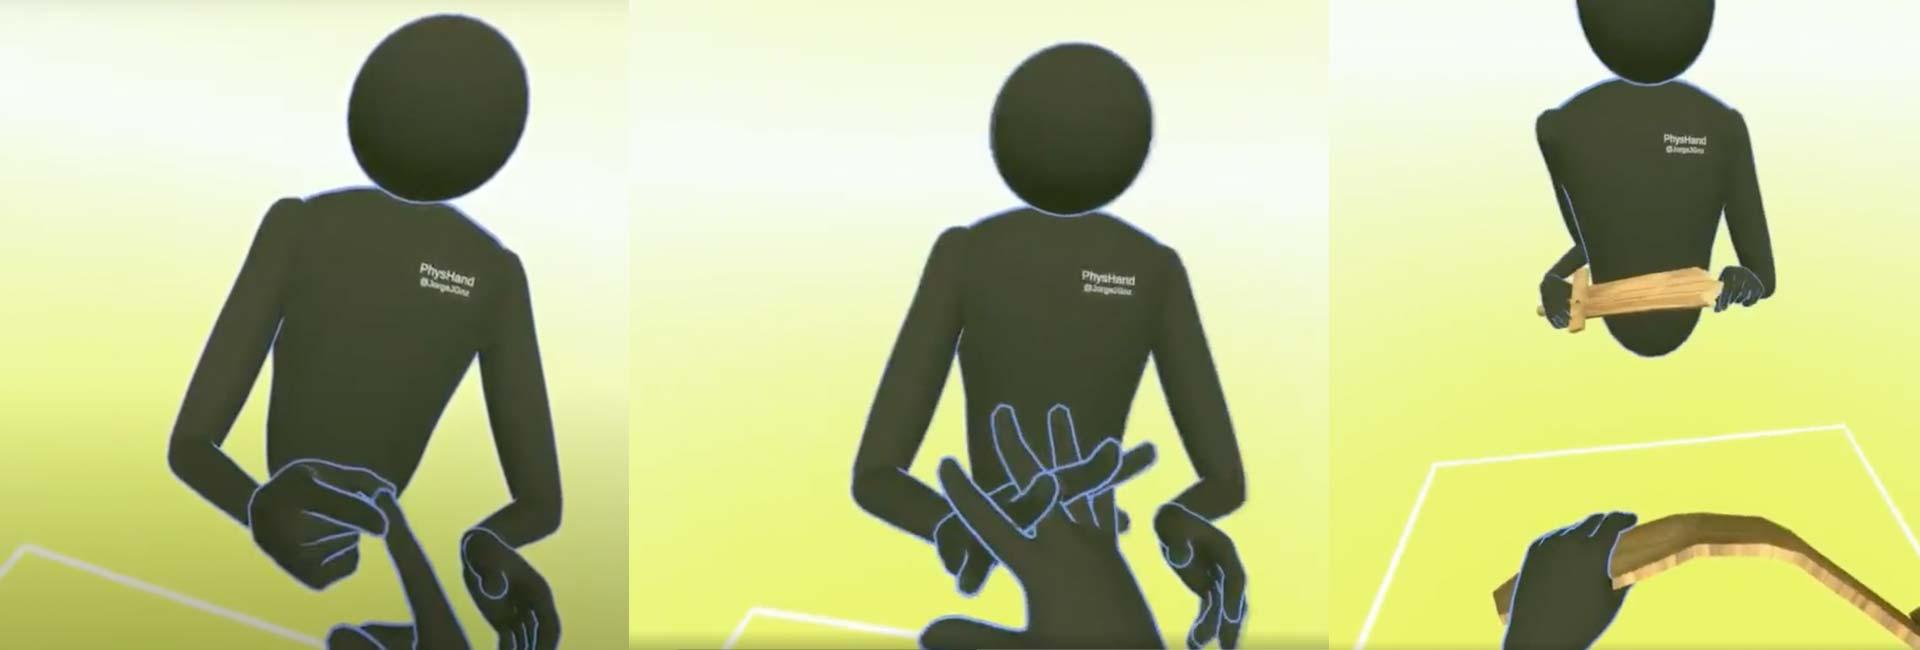 quest handtracking demo